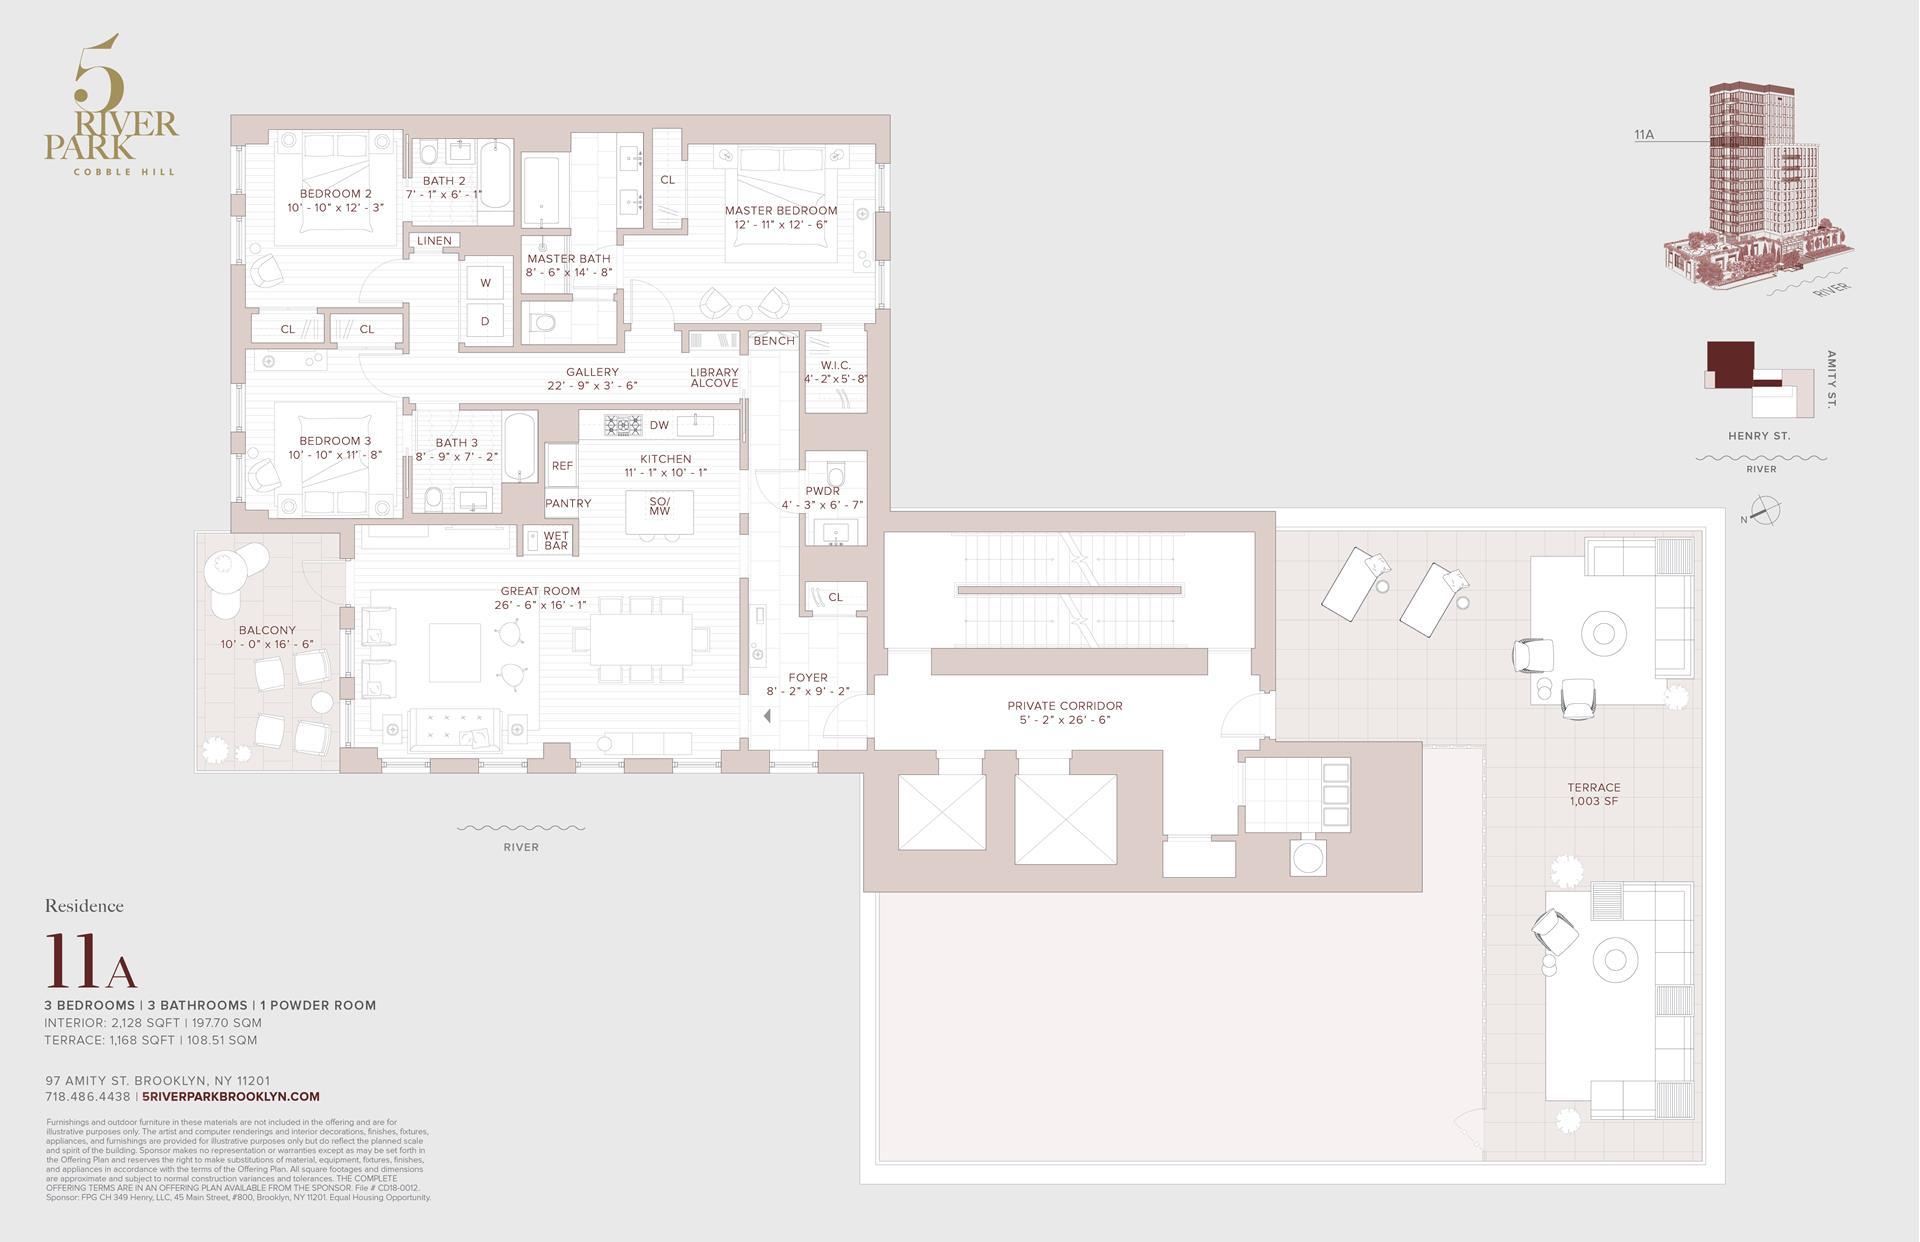 Floor plan of 5 River Park, 347 Henry St, 11A - Cobble Hill, New York